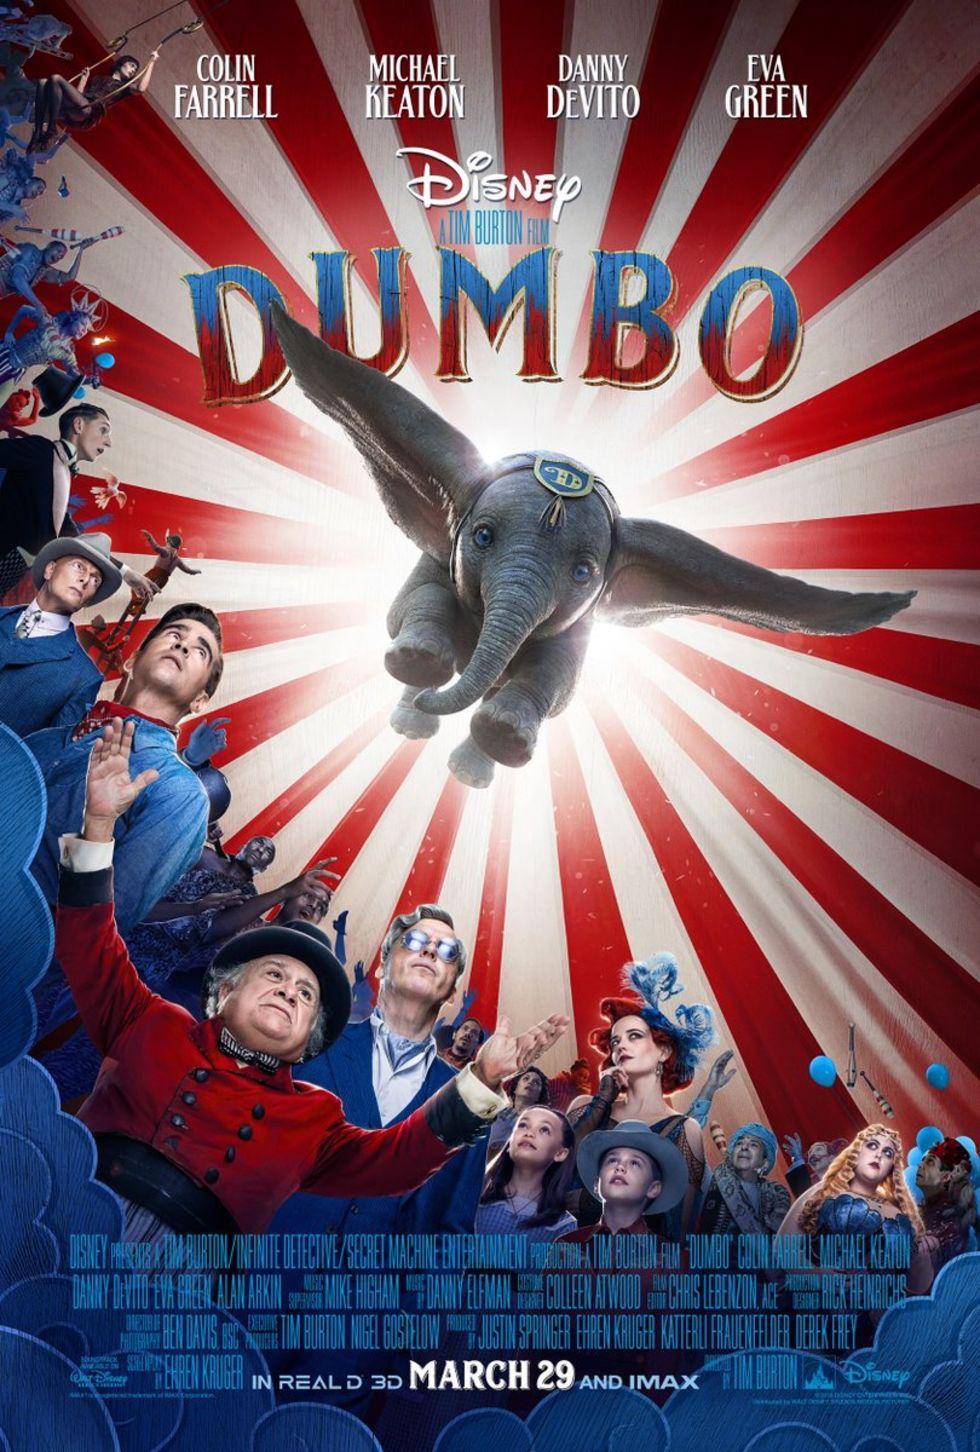 Kolla in trailern till Dumbo